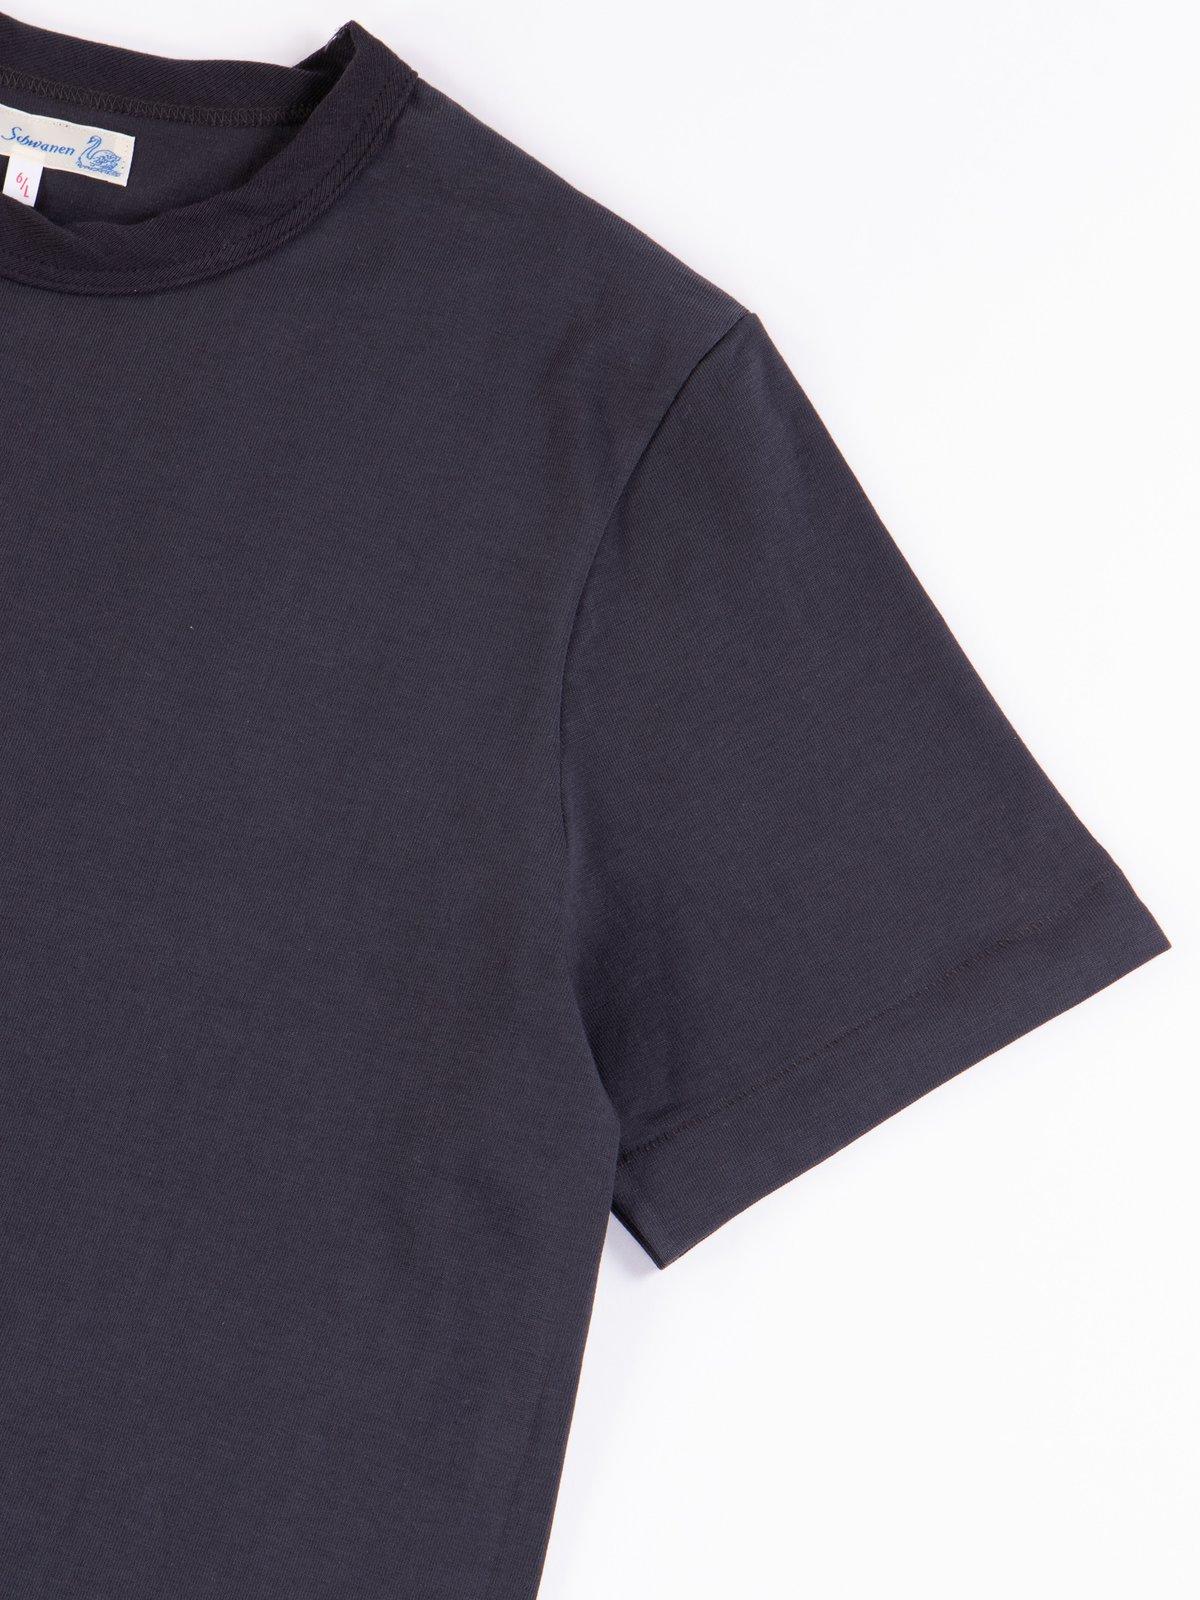 Slate 214 Organic Cotton Rundhals Shirt - Image 4